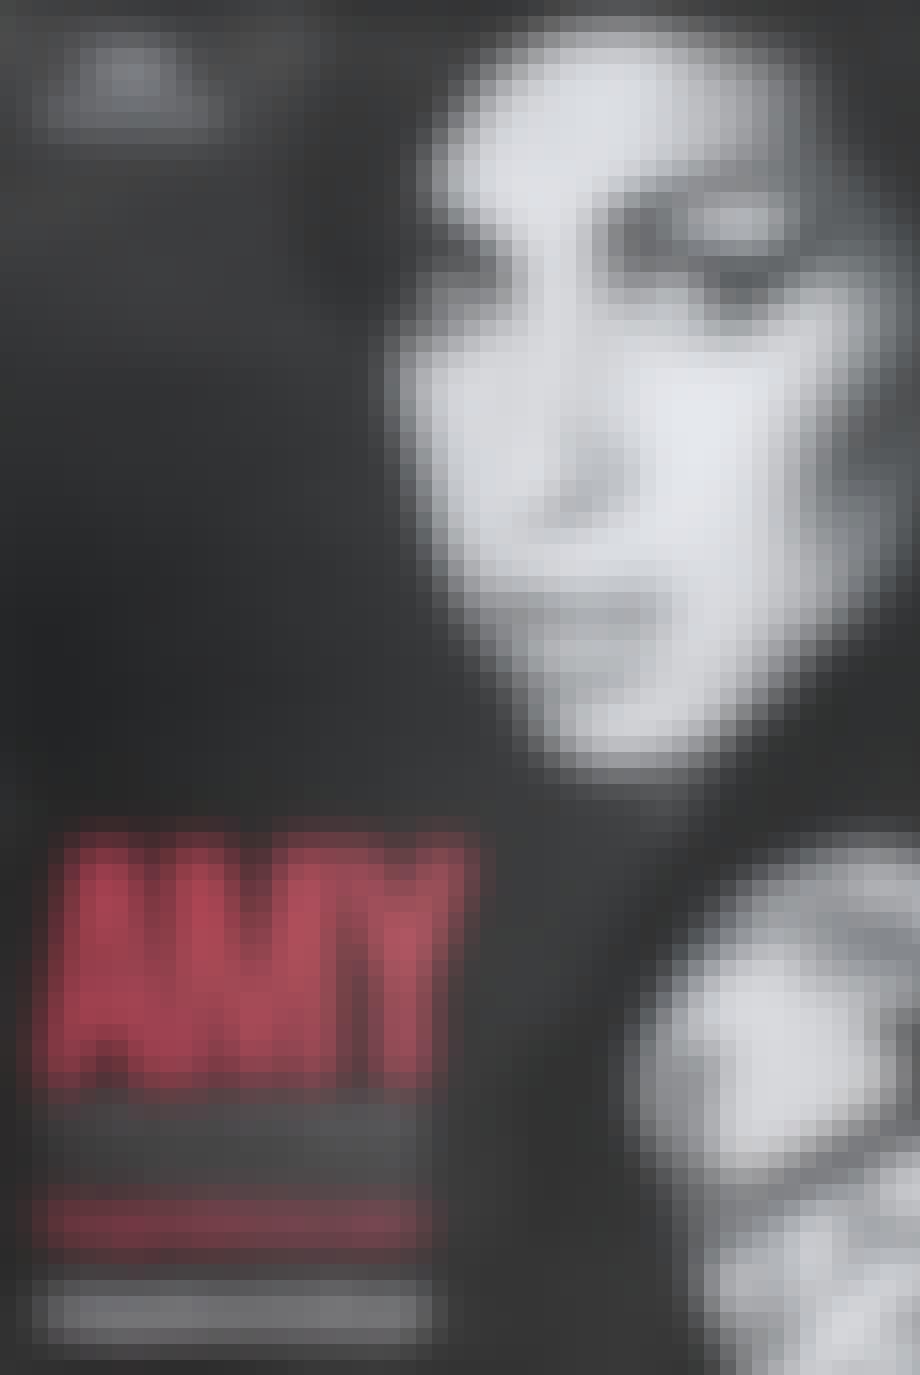 movieposter plakat af amy winehouse dokumentar